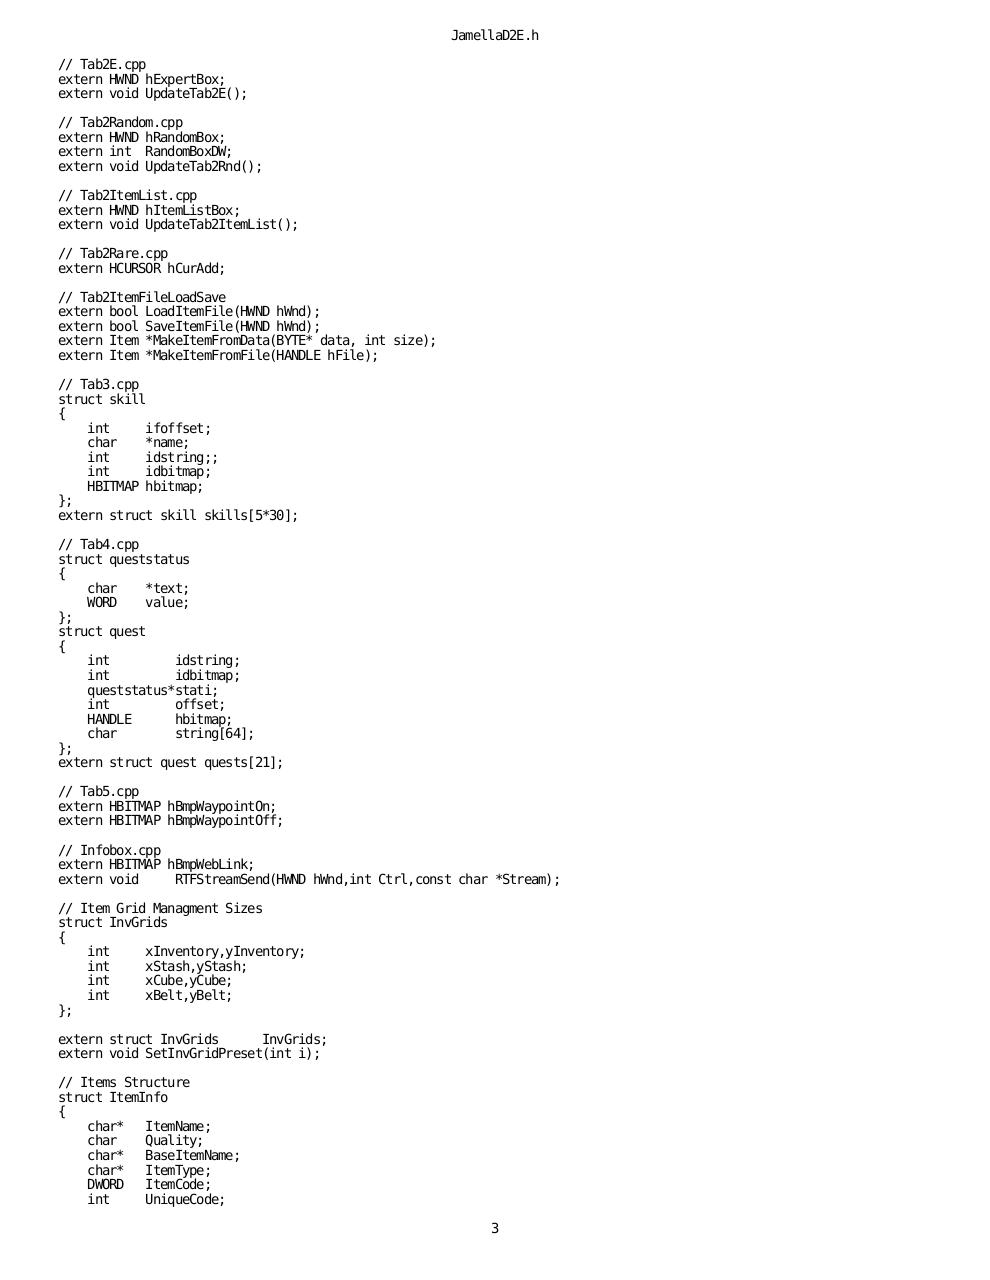 Microsoft Visual C++ by Zgium - Jamella Diablo II Source